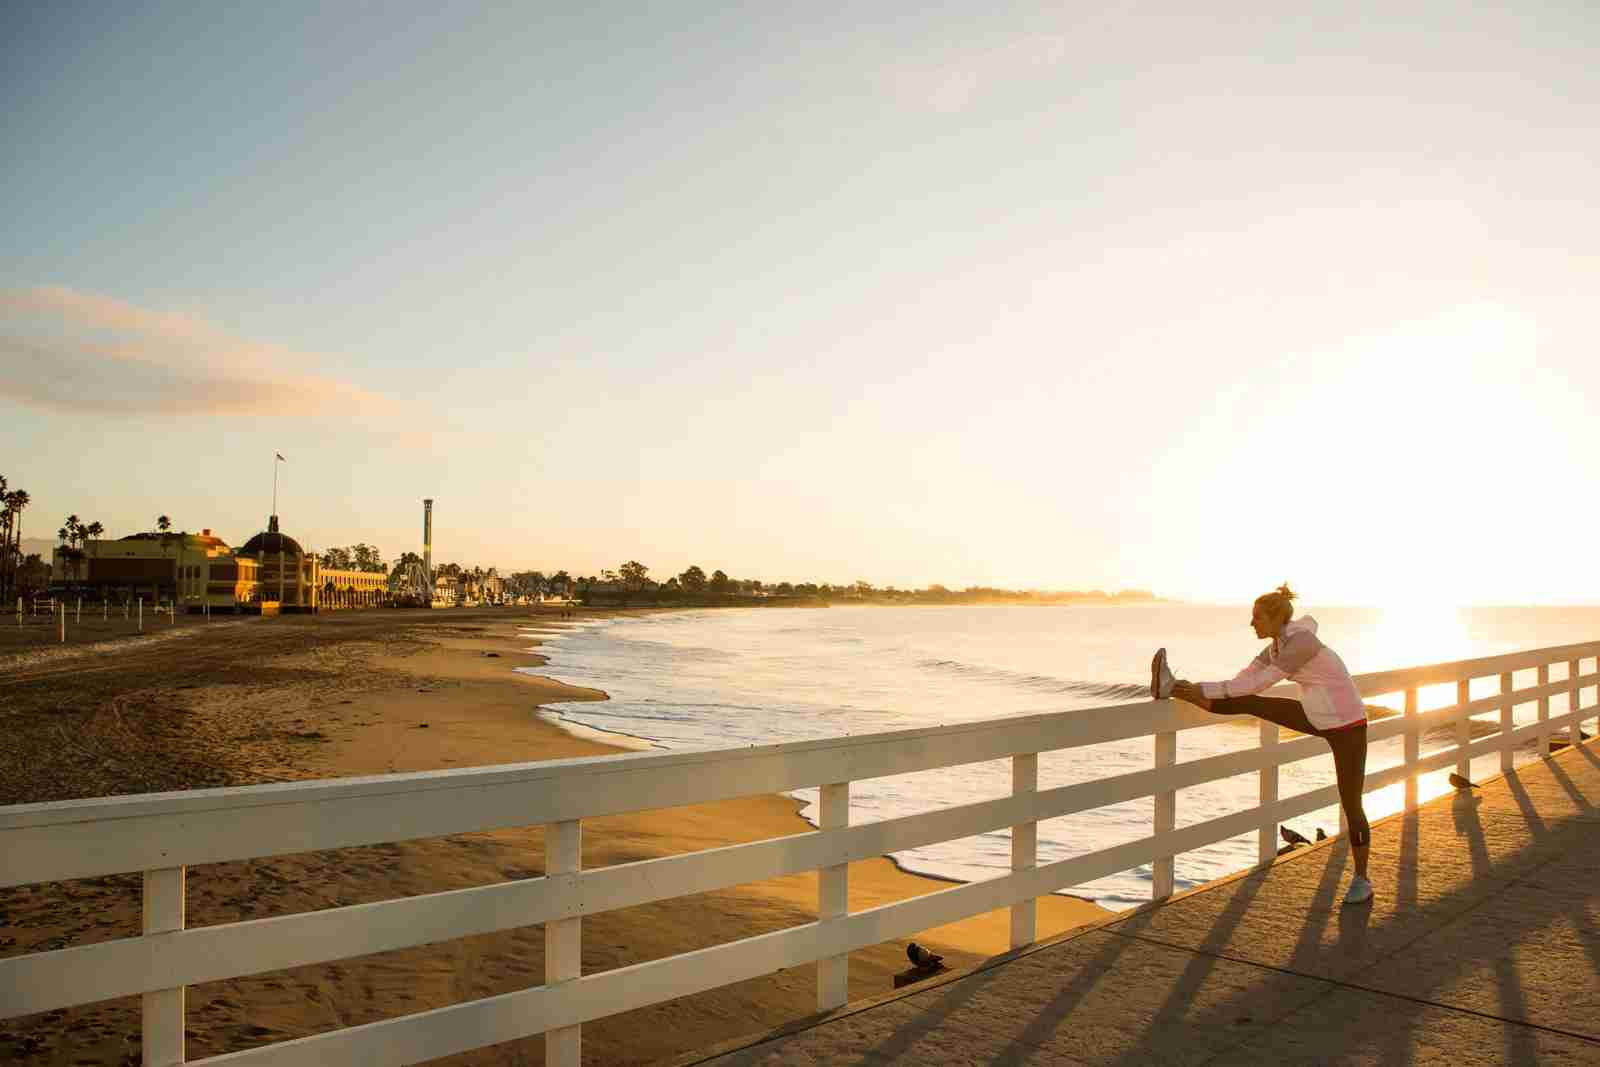 The Santa Cruz boardwalk. (Photo by Jordan Siemens/Getty Images)